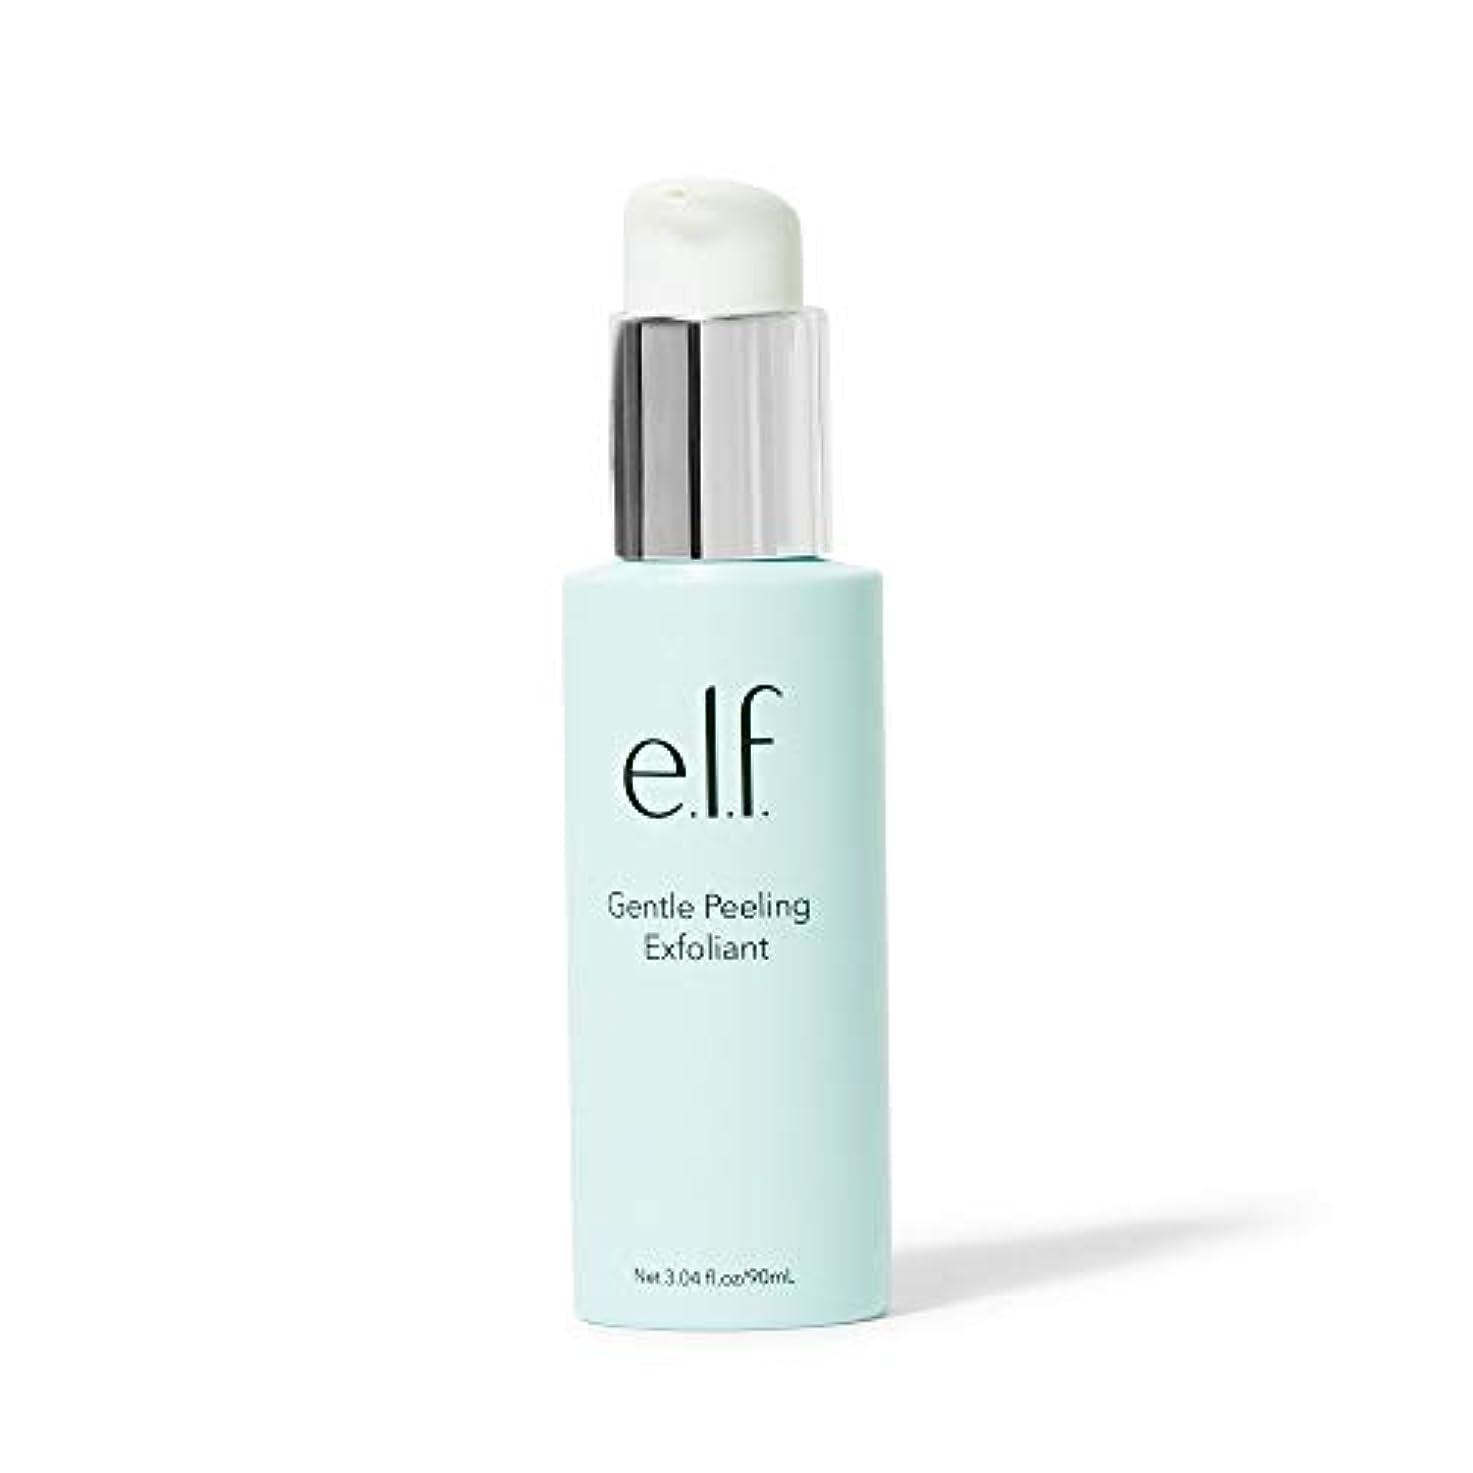 (6 Pack) e.l.f. Gentle Peeling Exfoliant (並行輸入品)